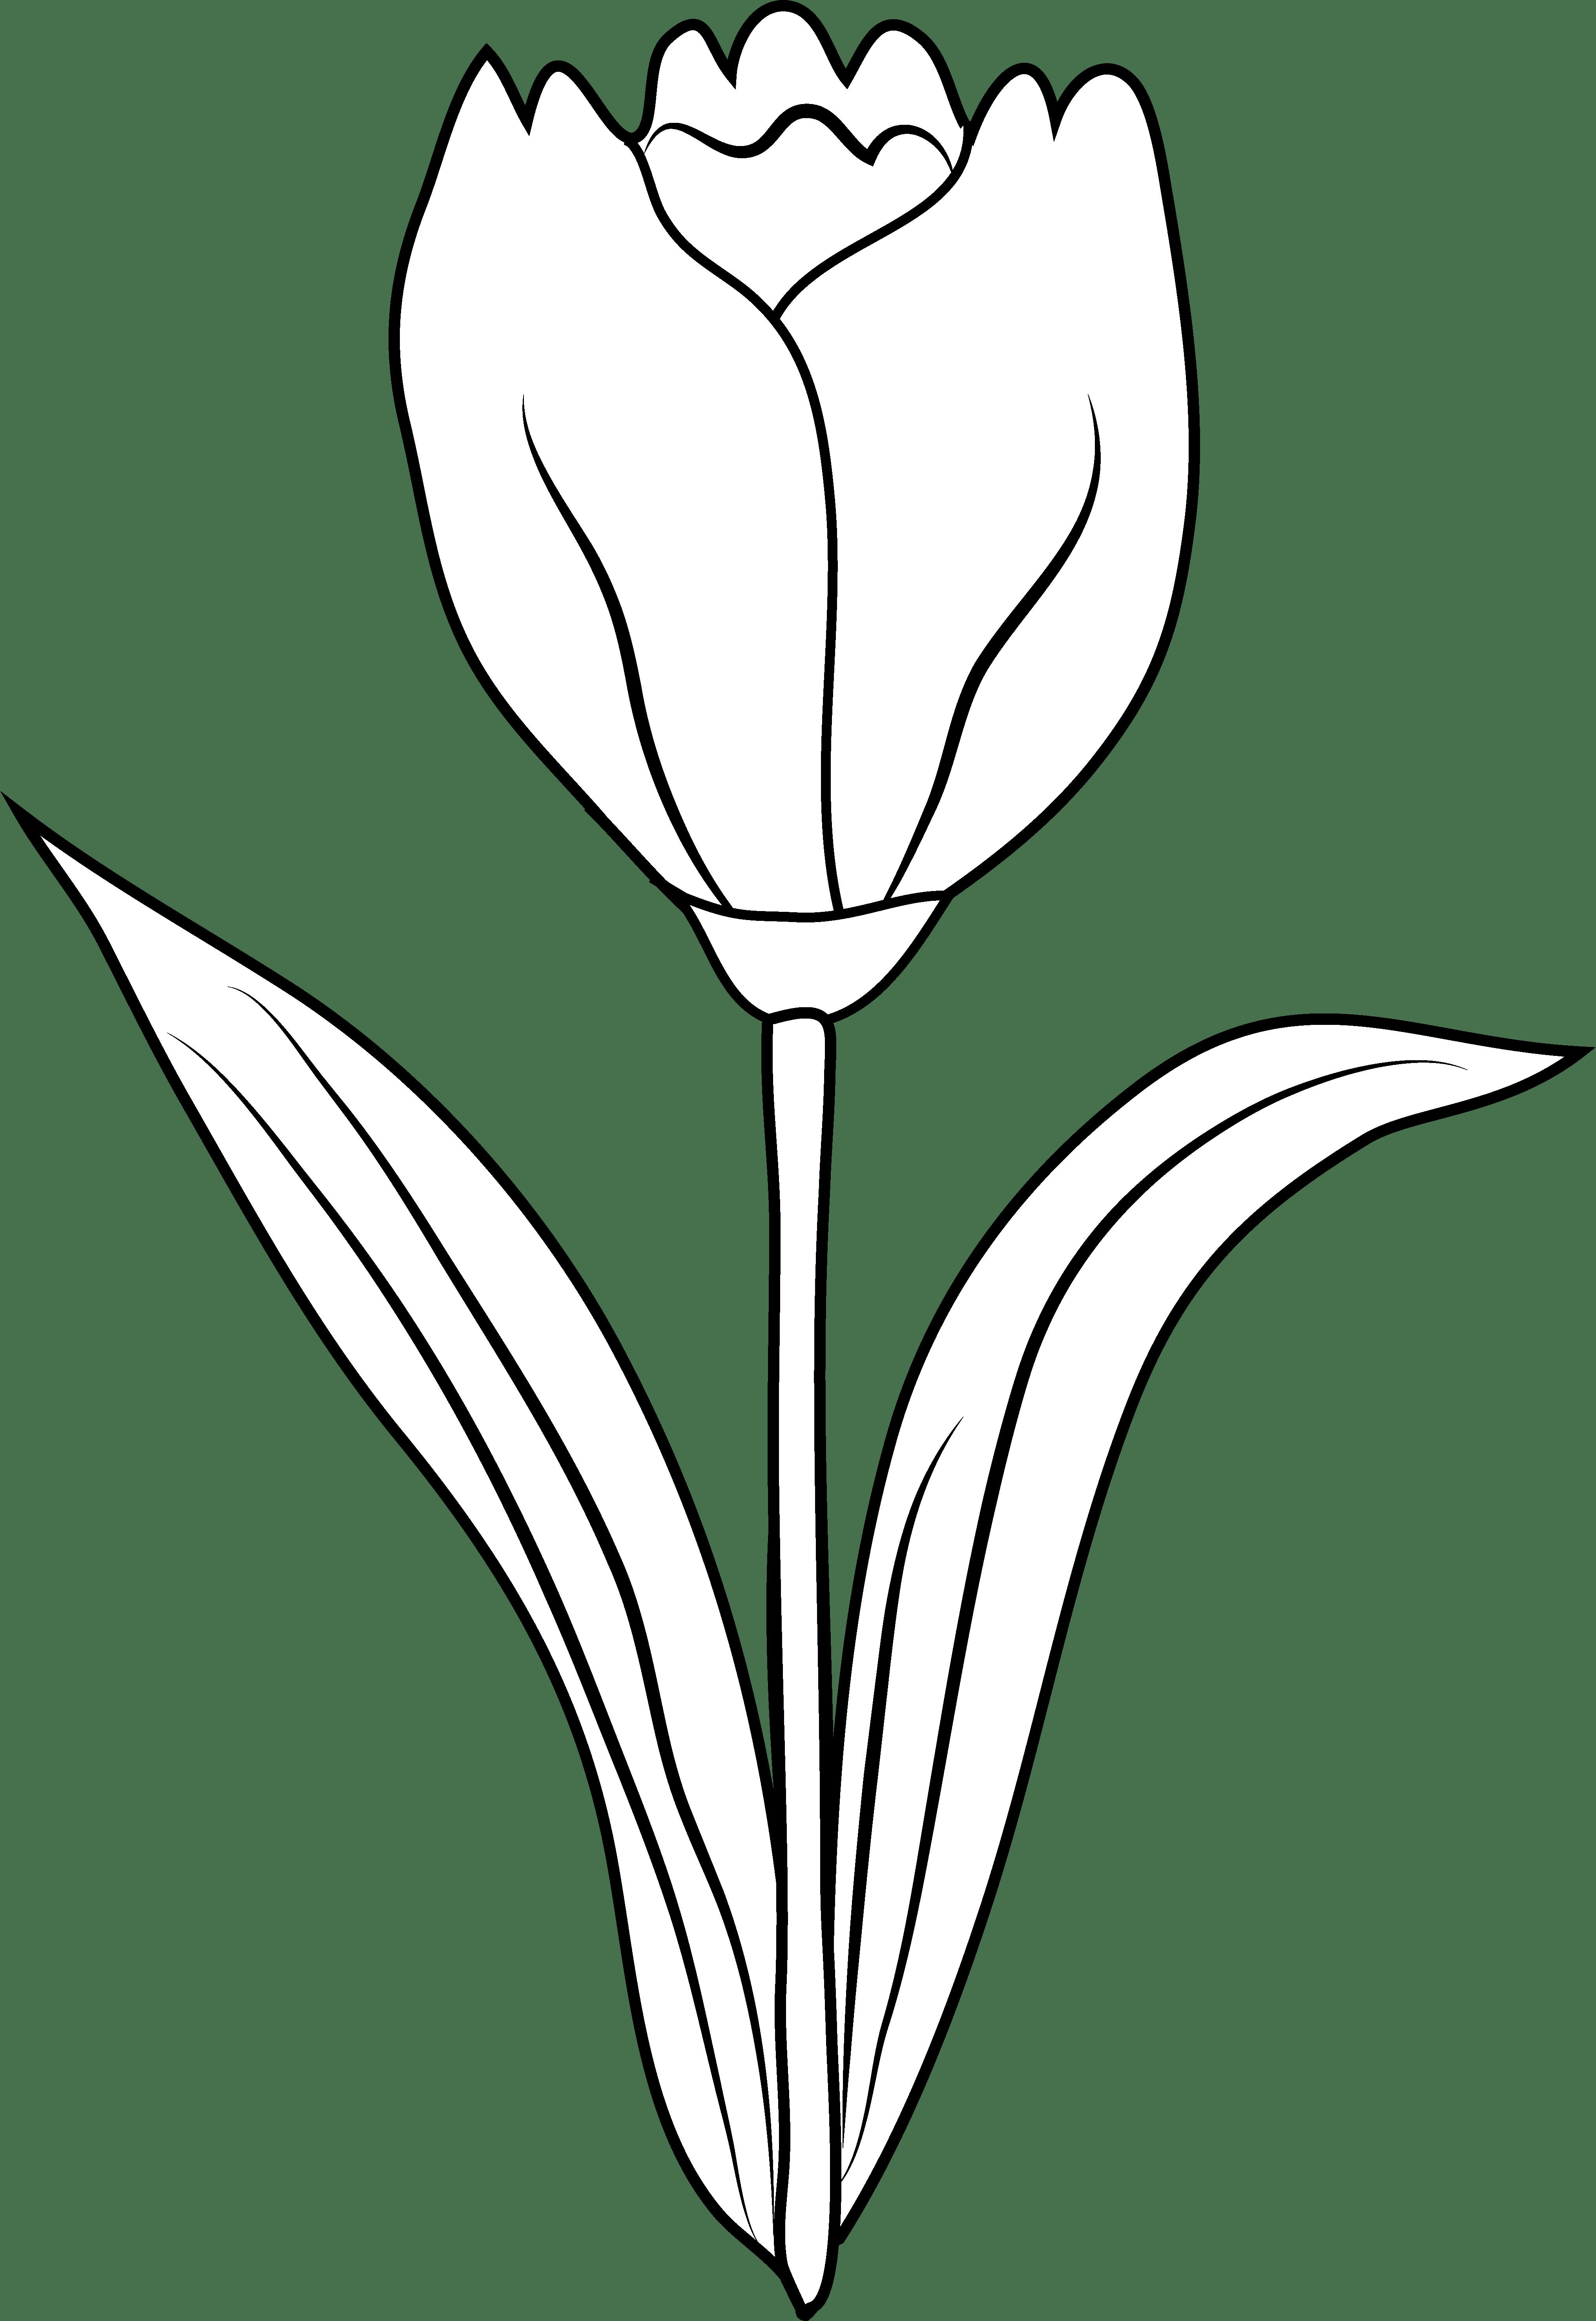 Clipart Flower Black And White